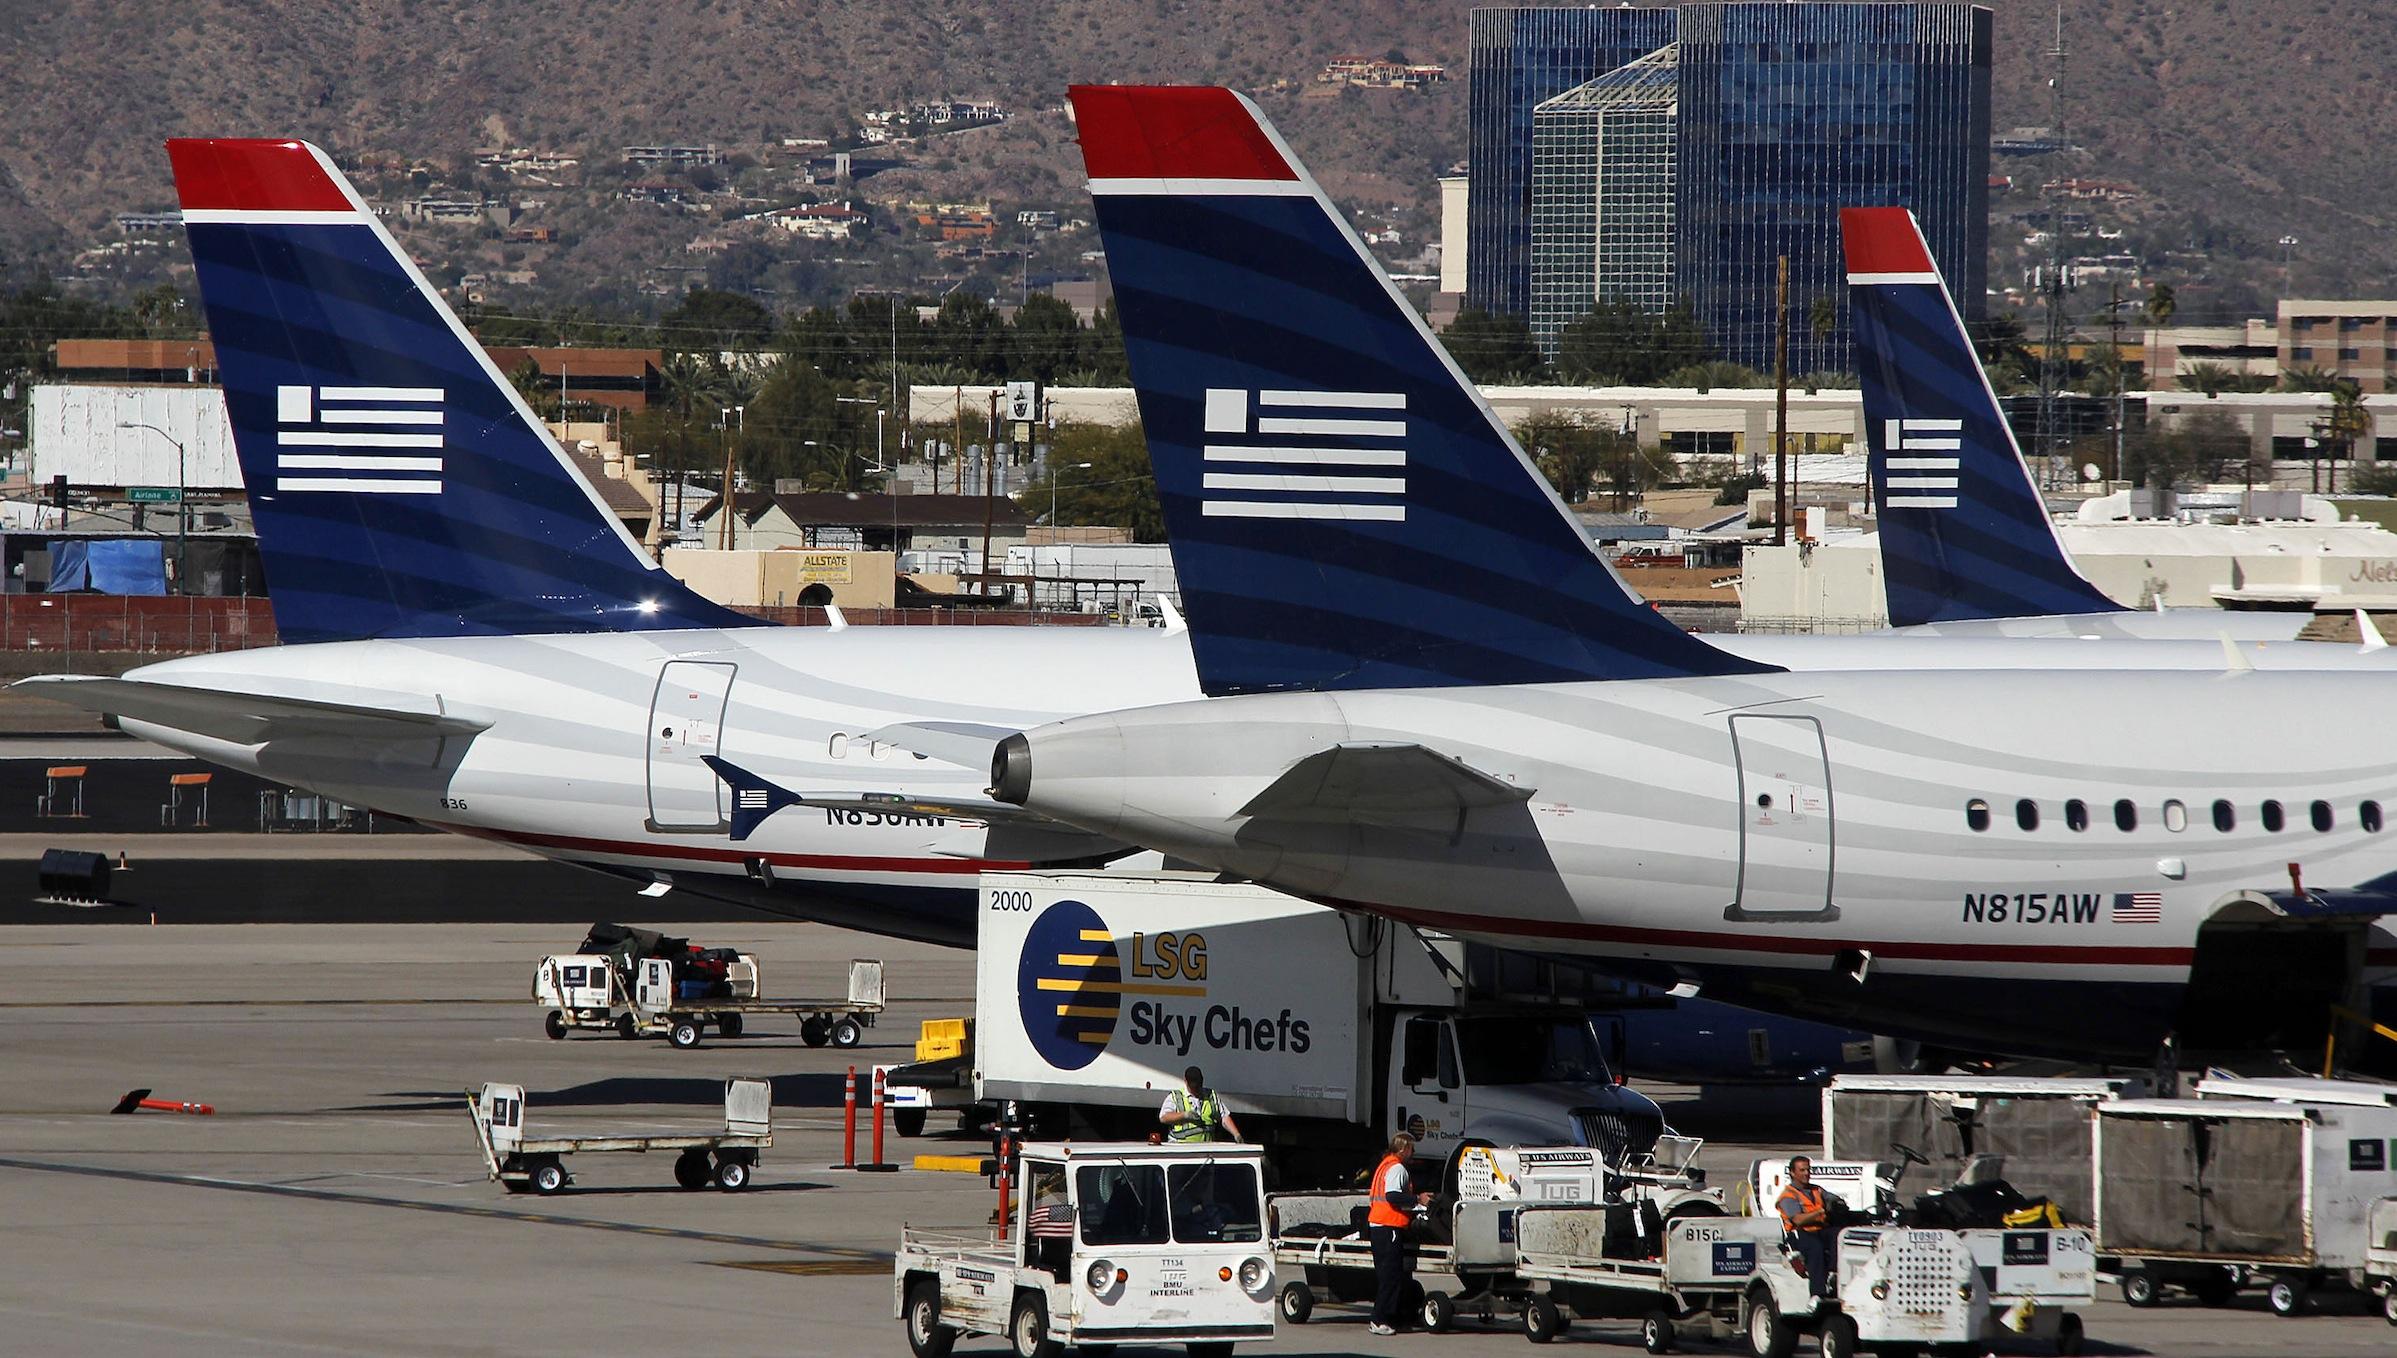 This March 1, 2013 photo shows  USAirways Airbus aircraft at Phoenix Sky Harbor International Airport. (AP Photo/Gene J. Puskar, File)